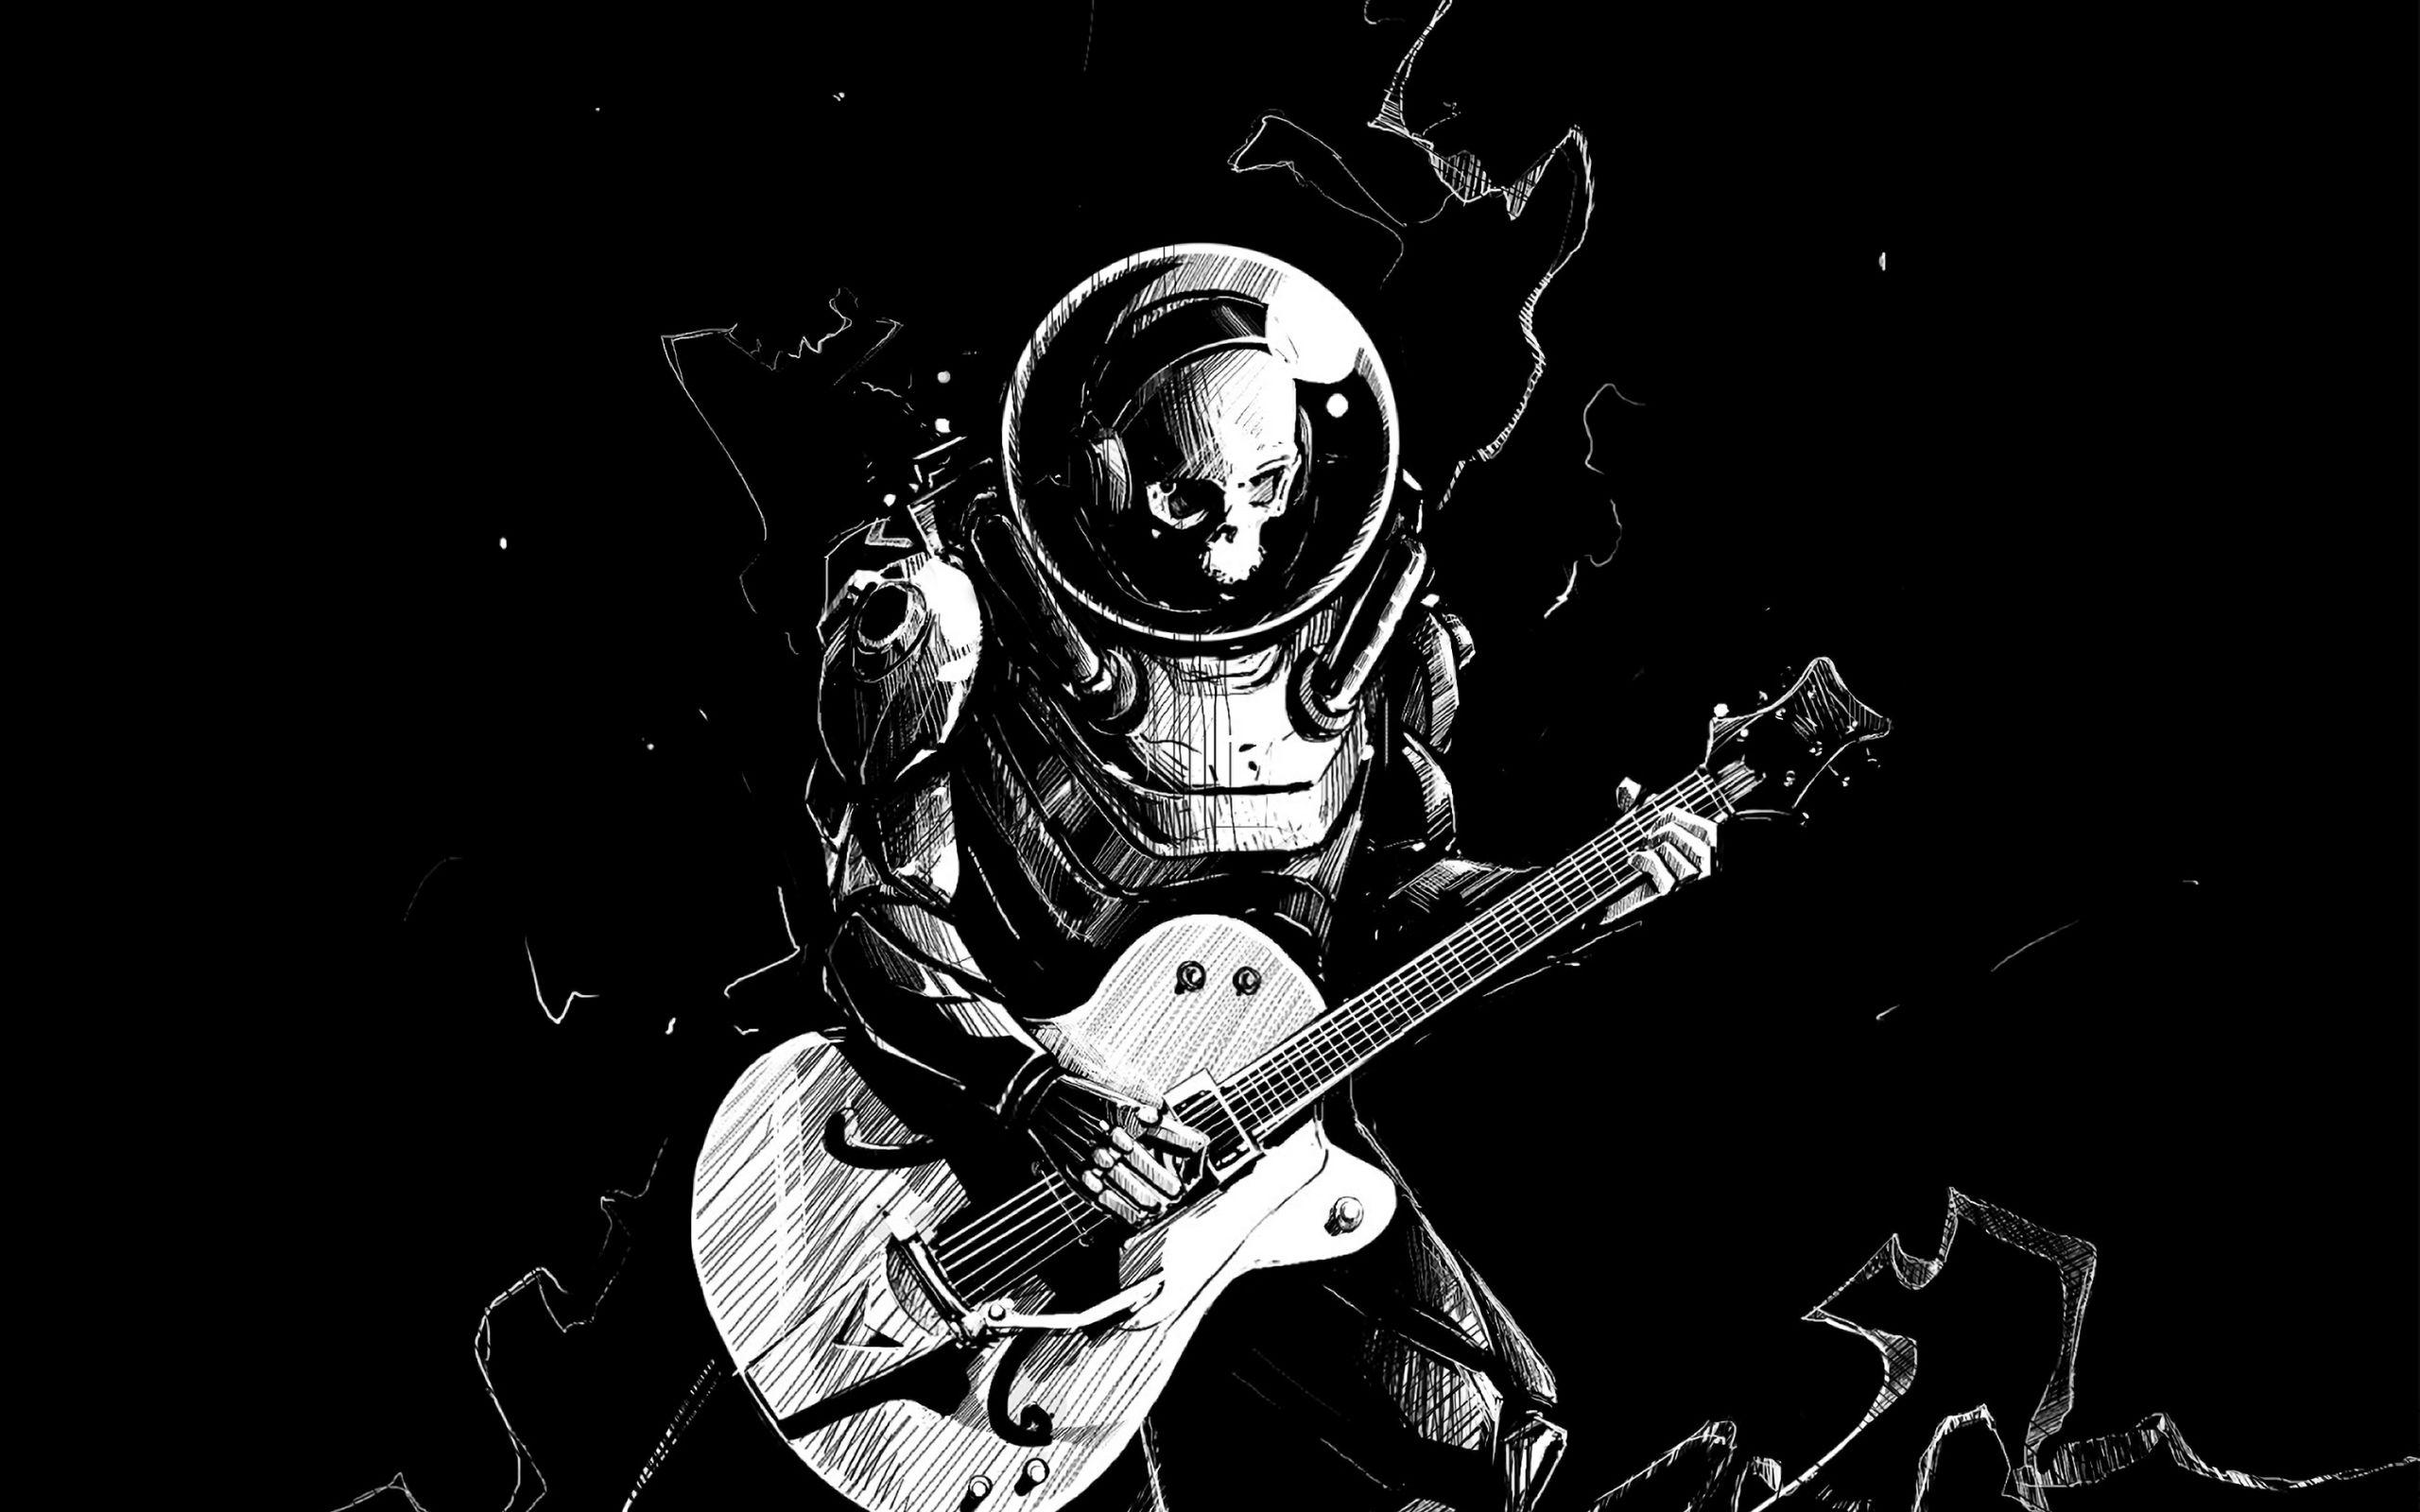 2560x1600 Wallpaper skeleton, guitar, bw, guitarist, spacesuit, art